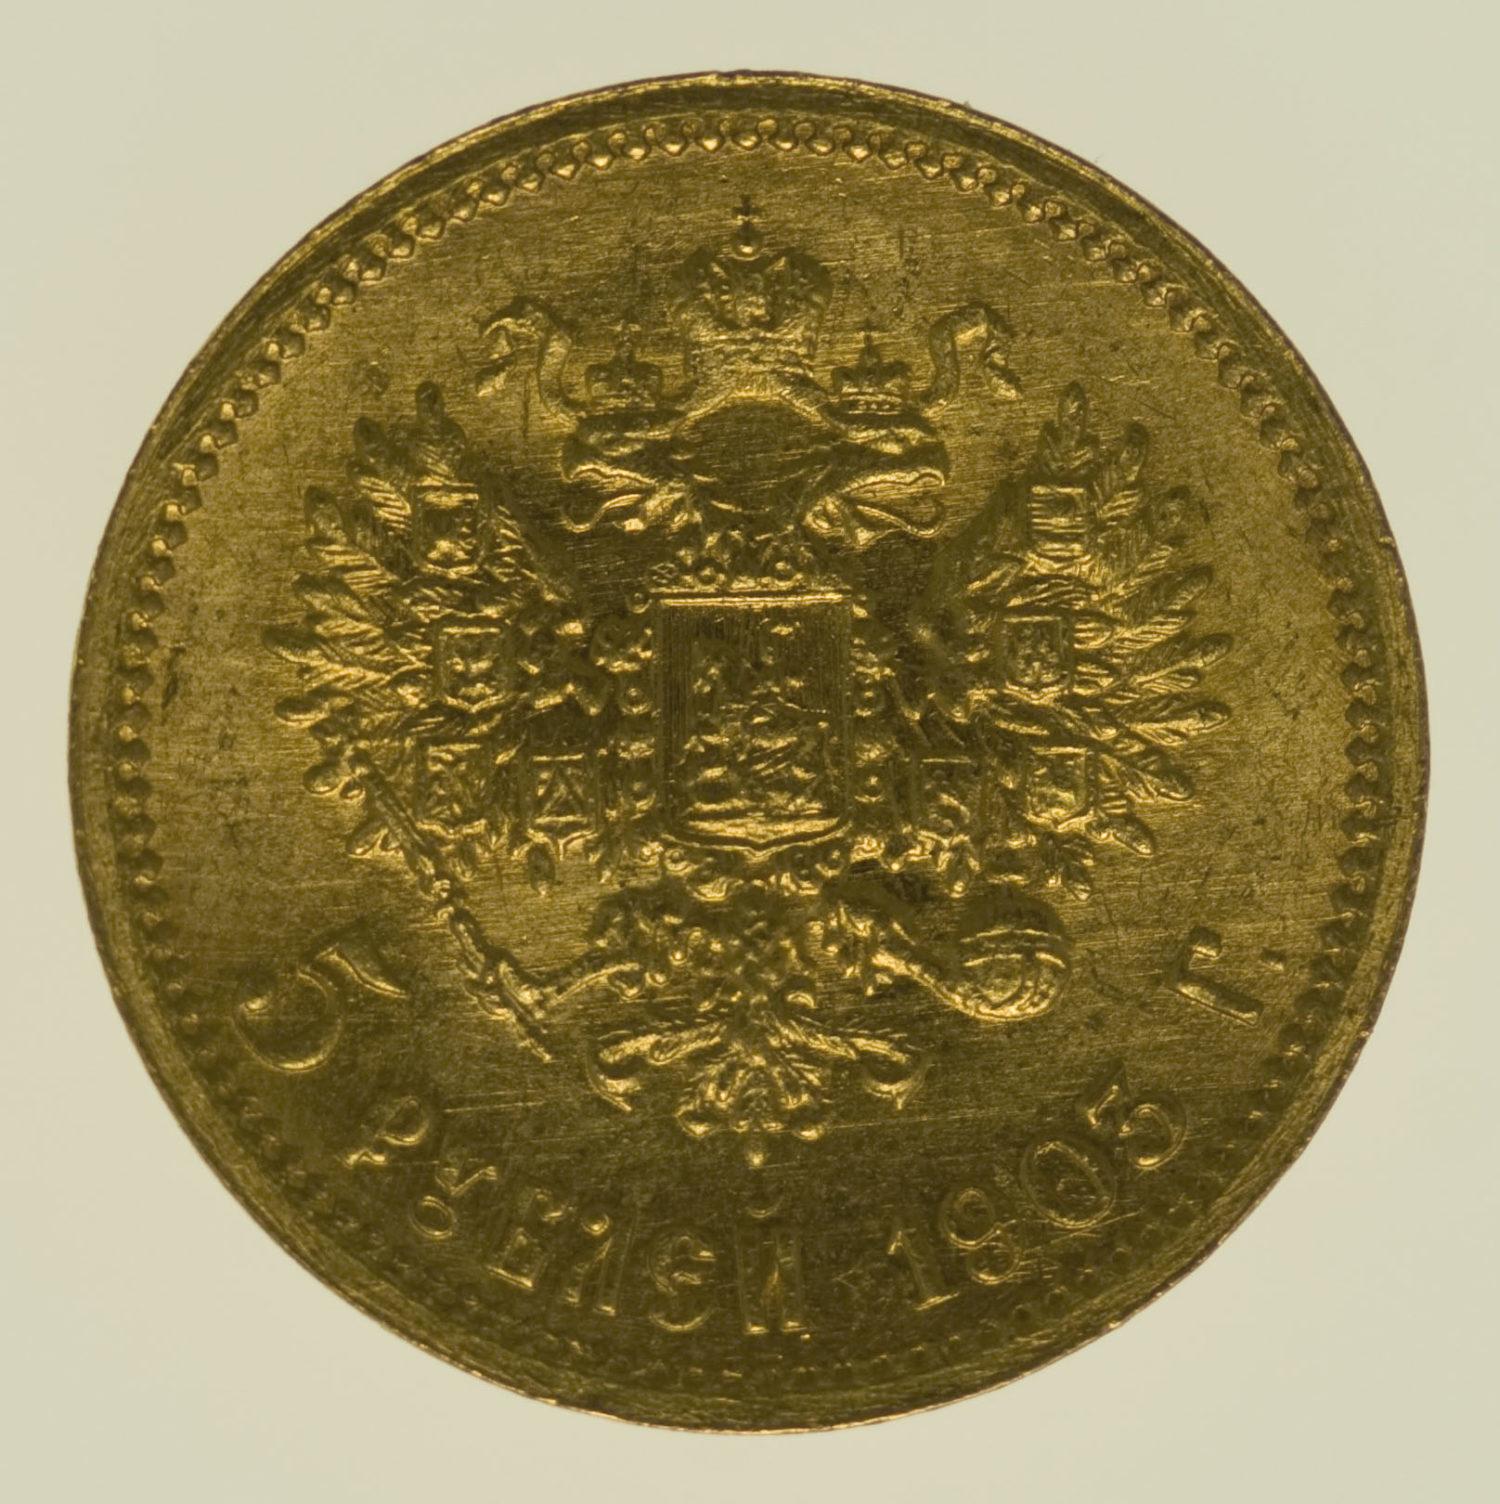 russland - RusslandNikolaus II. 5 Rubel 1903